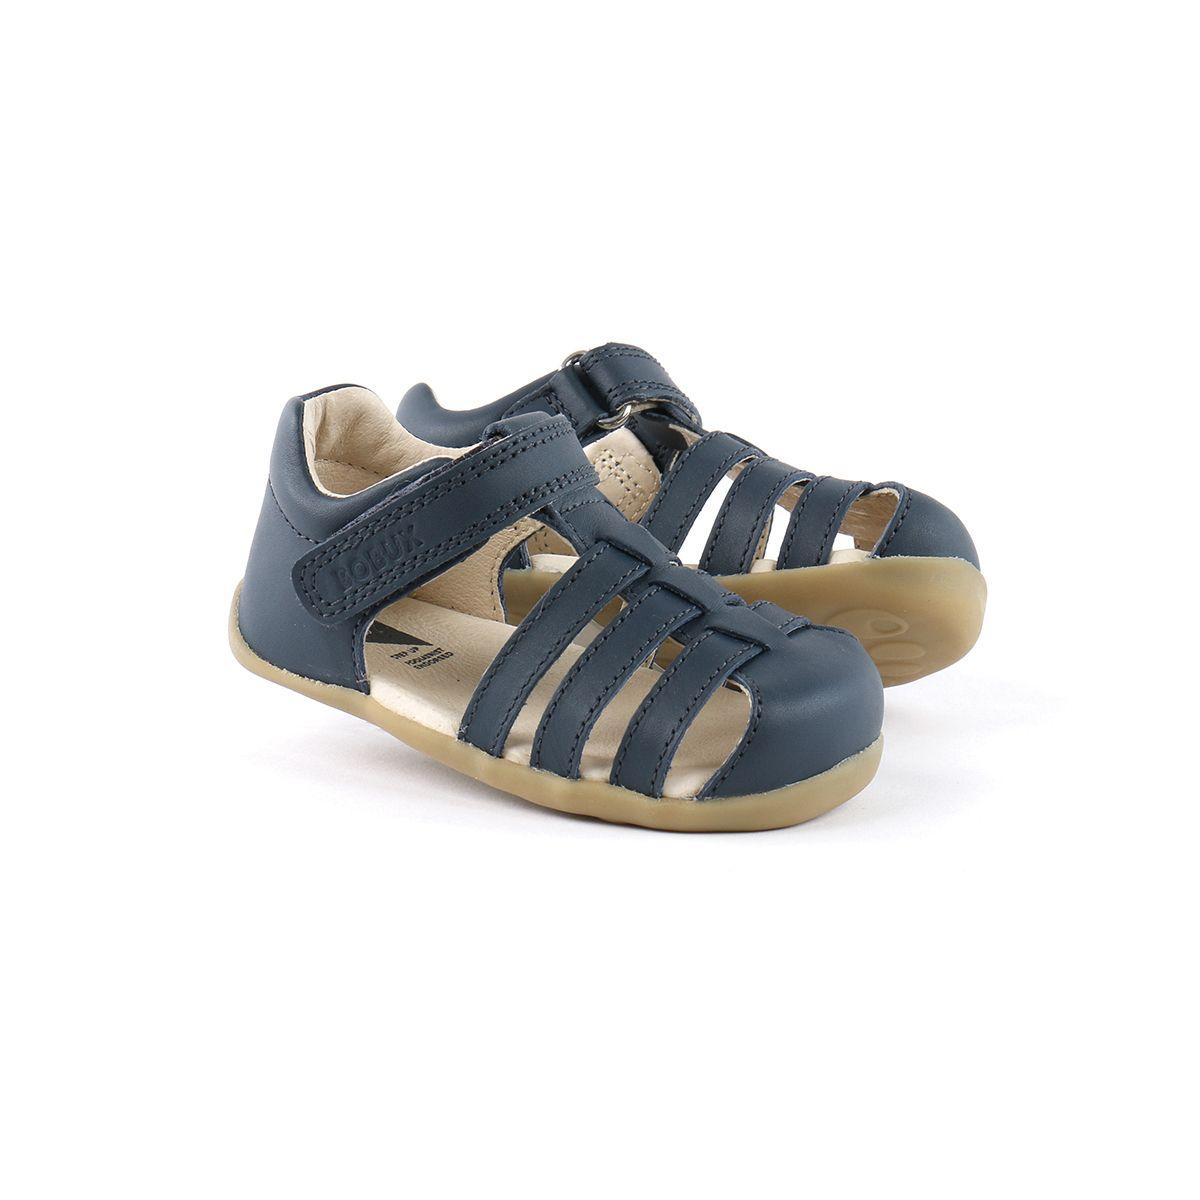 Chaussures Step Up Jump Navy Sebio